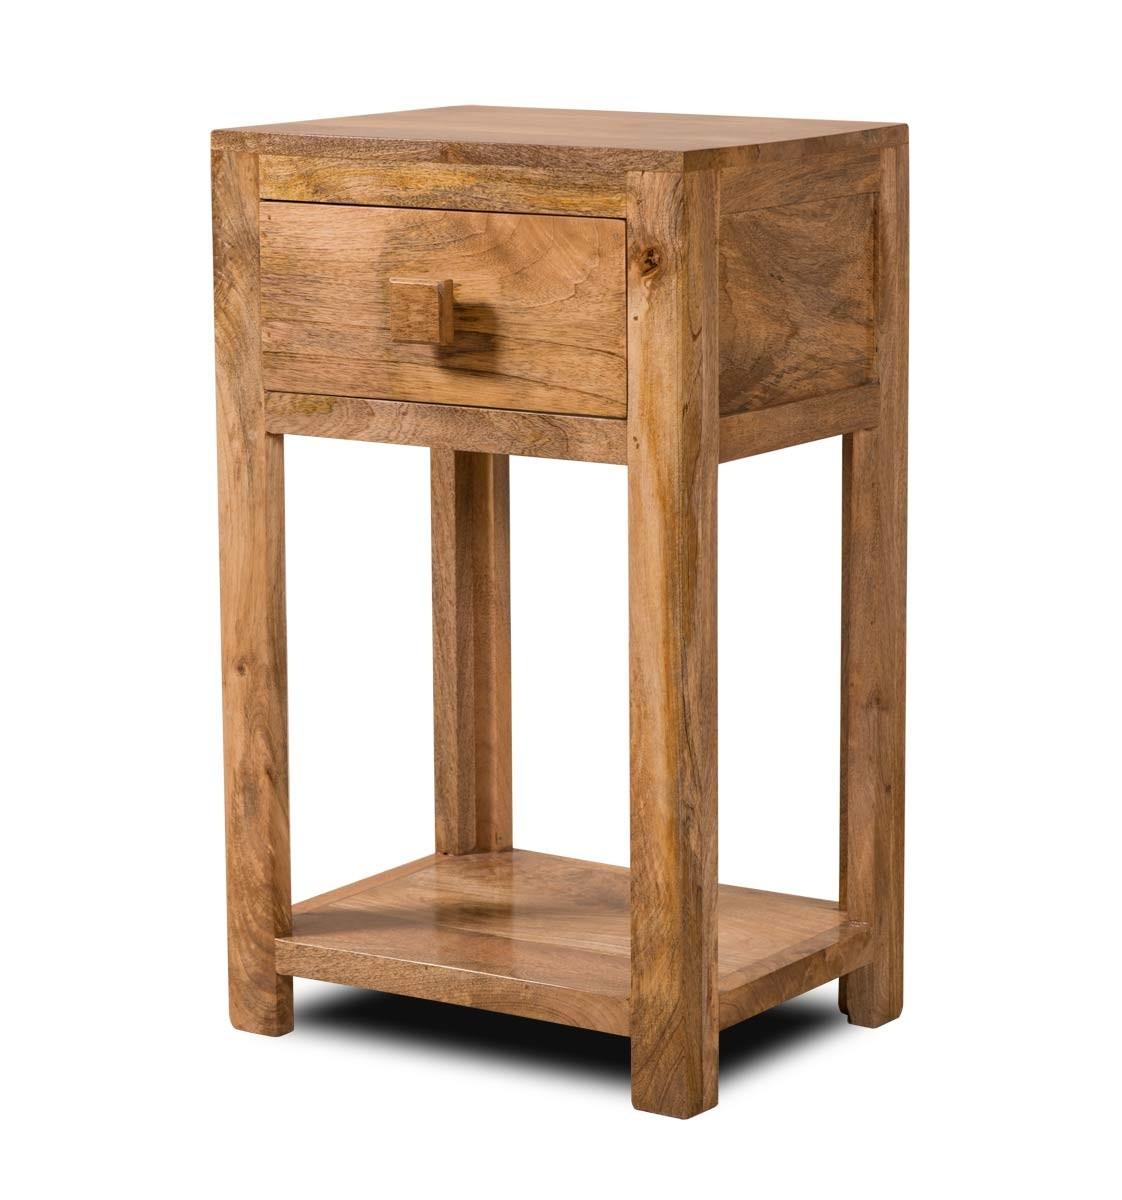 Dakota light mango lamp table casa bella furniture uk dakota light mango lamp table 1 aloadofball Images